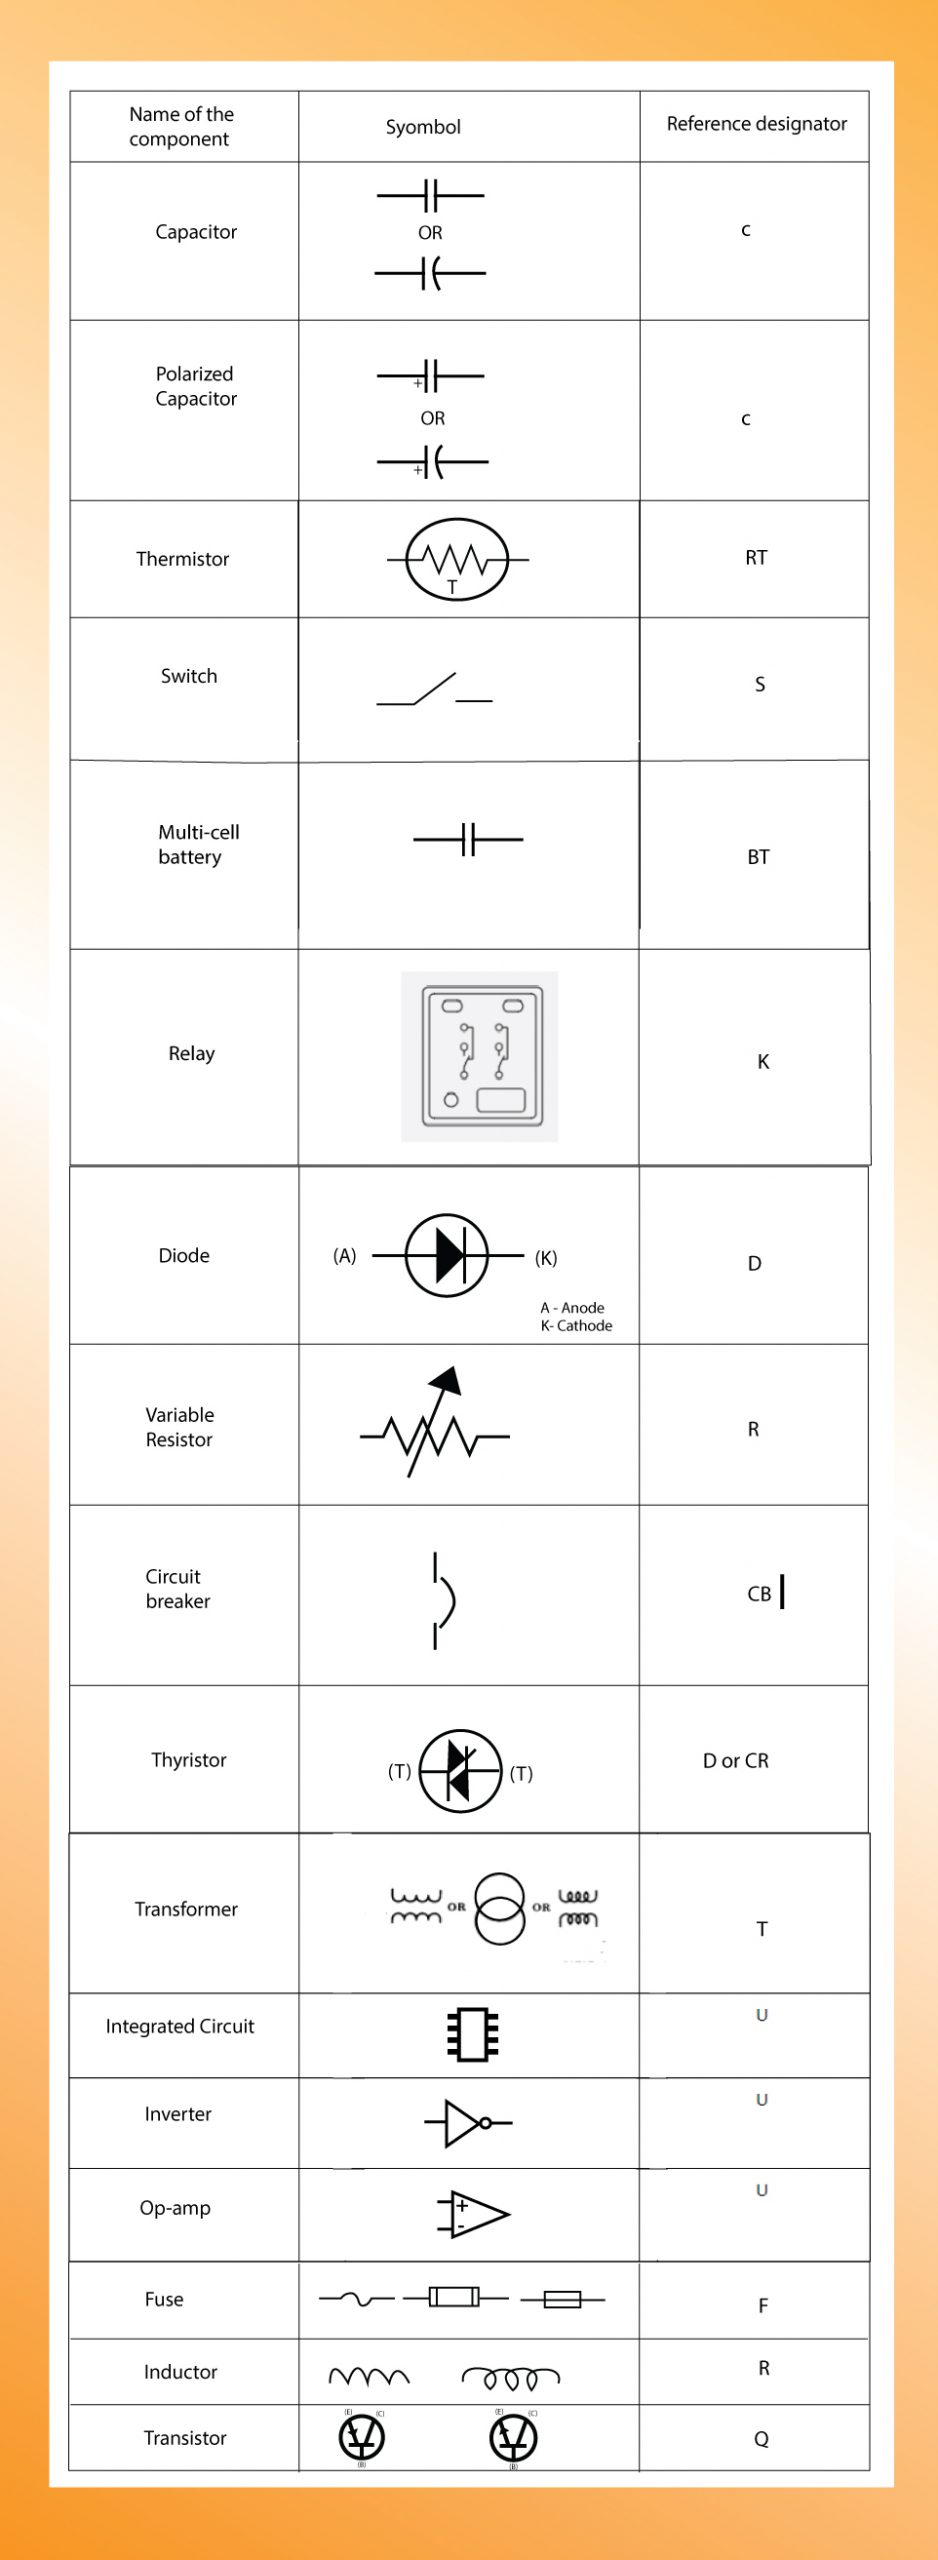 Common schematic symbols used in PCB schematic diagram